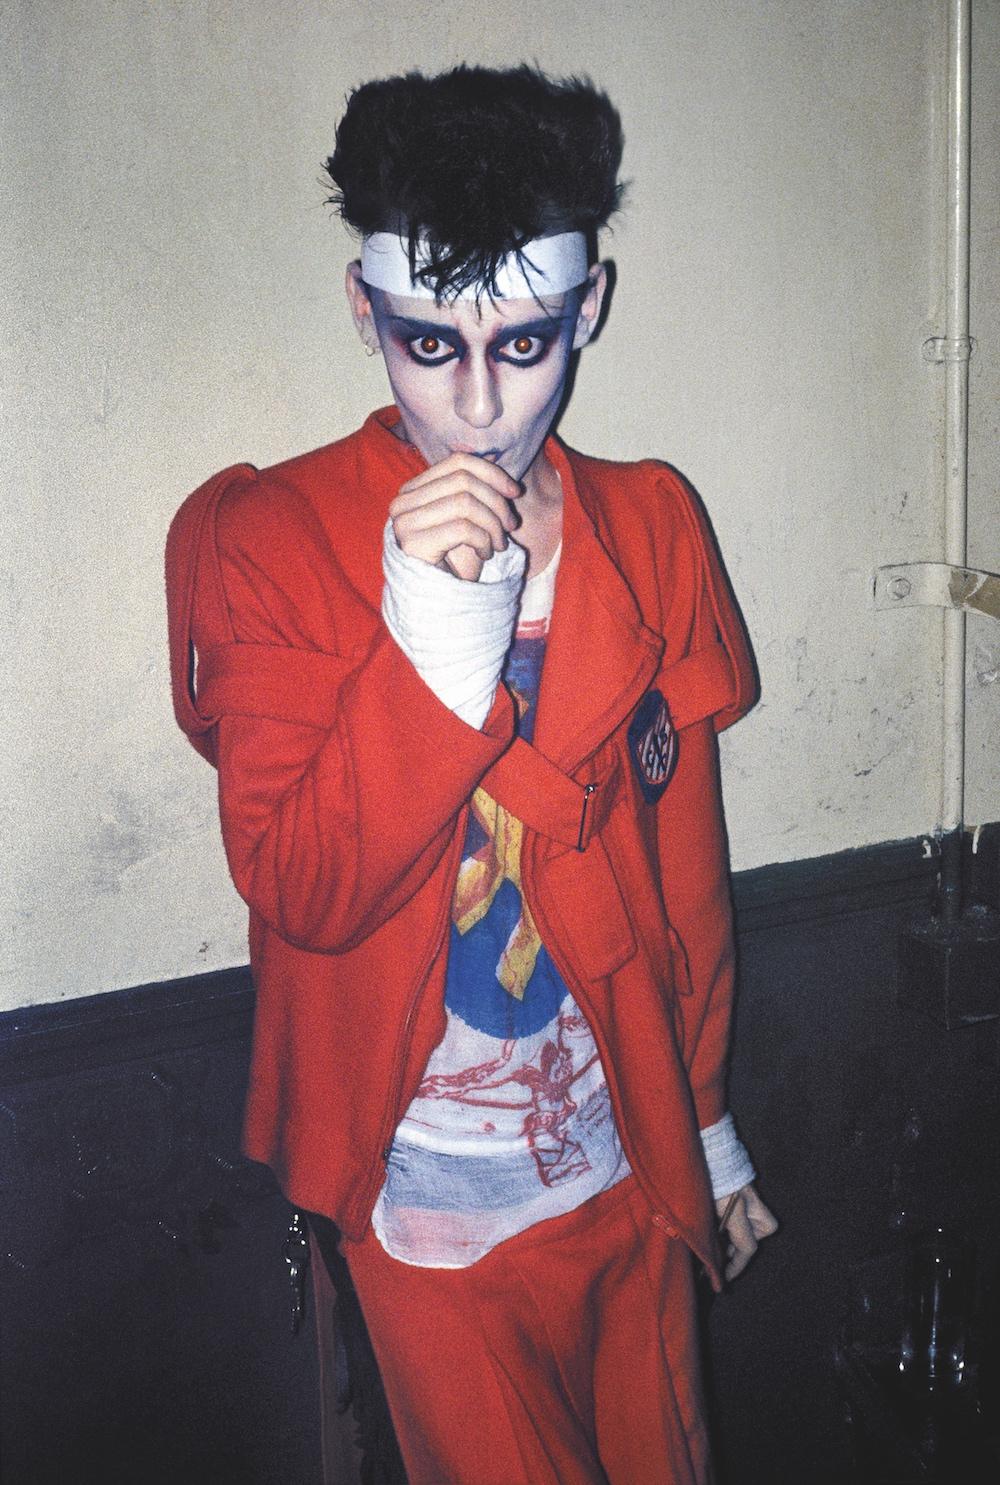 Stephen Linard at the Blitz Club, London Photo by Derek Ridgers